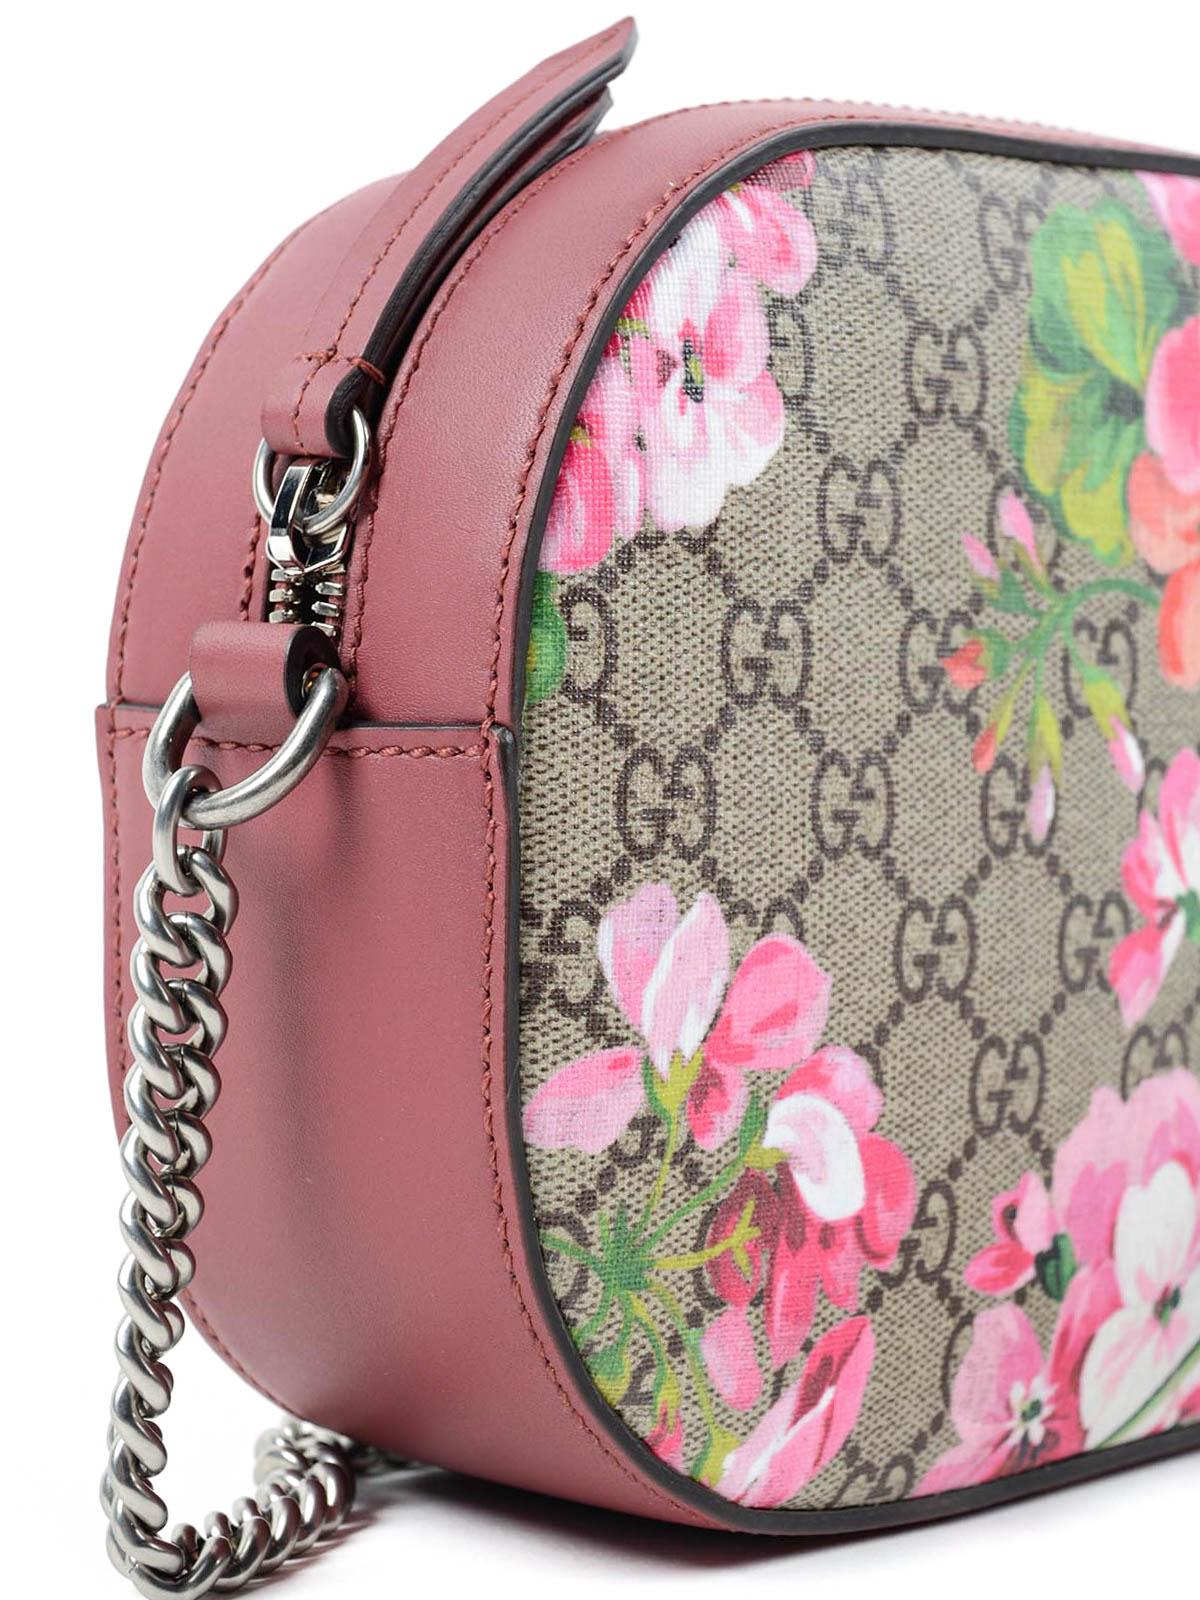 a79d1c28ede Gucci - Blooms GG supreme mini chain bag - cross body bags - 409535 ...